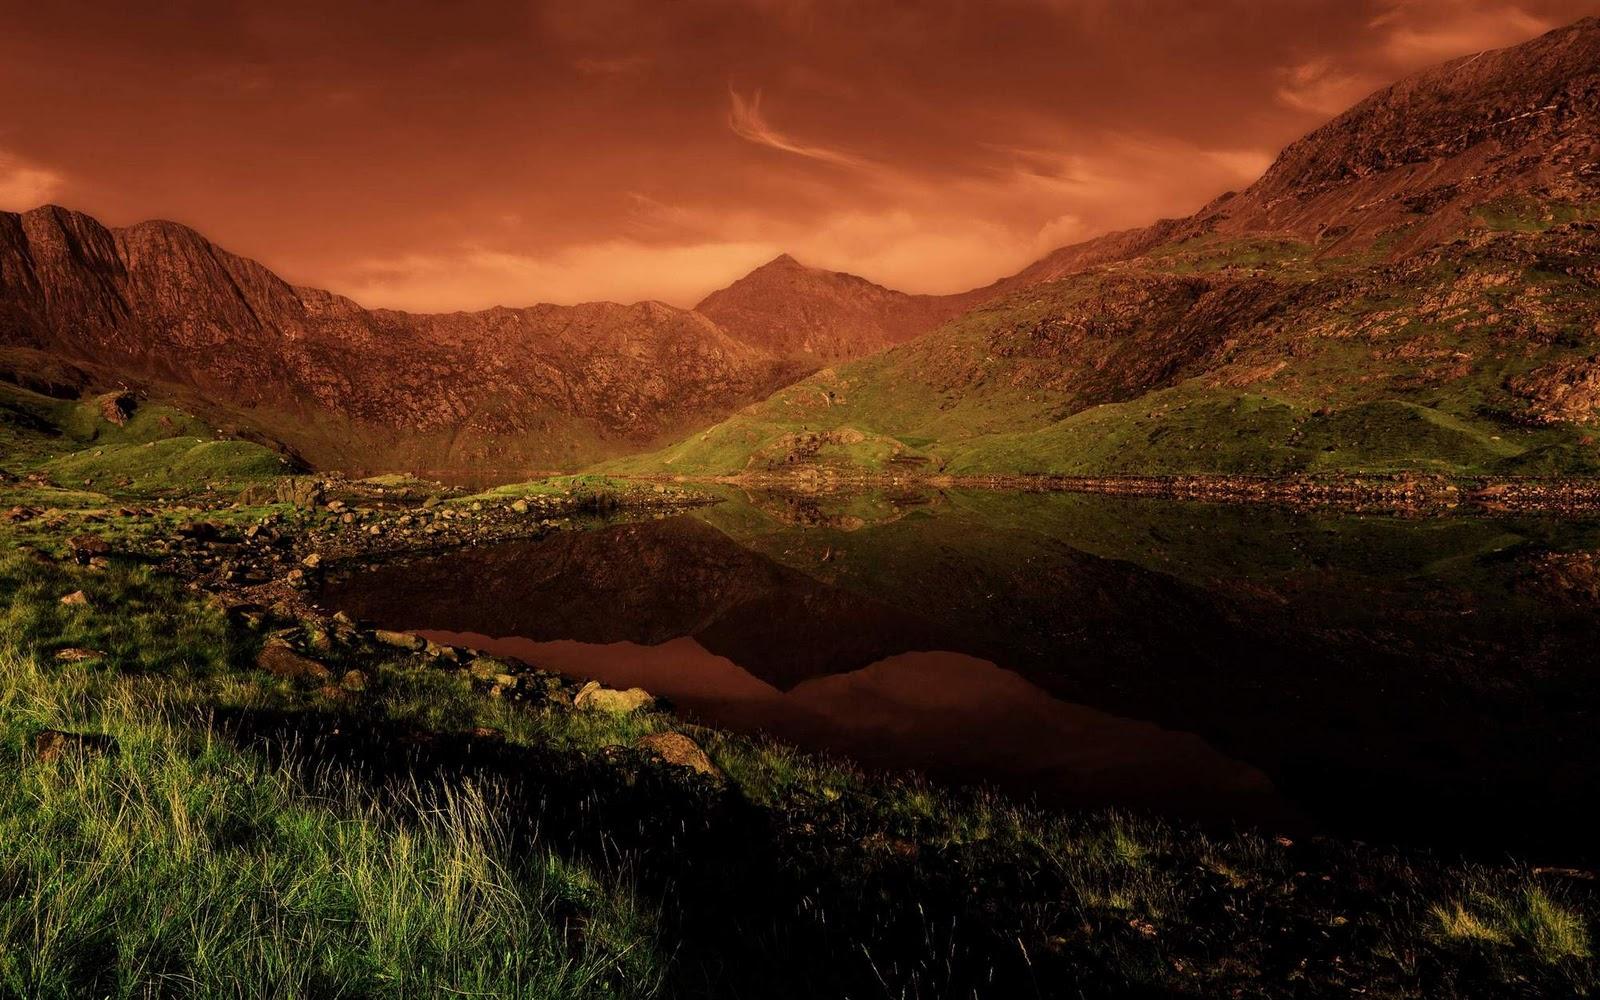 Top 10 Desktop Wallpapers Wallpaper Hd Base Snowdonia National Park 1600x1000 Download Hd Wallpaper Wallpapertip